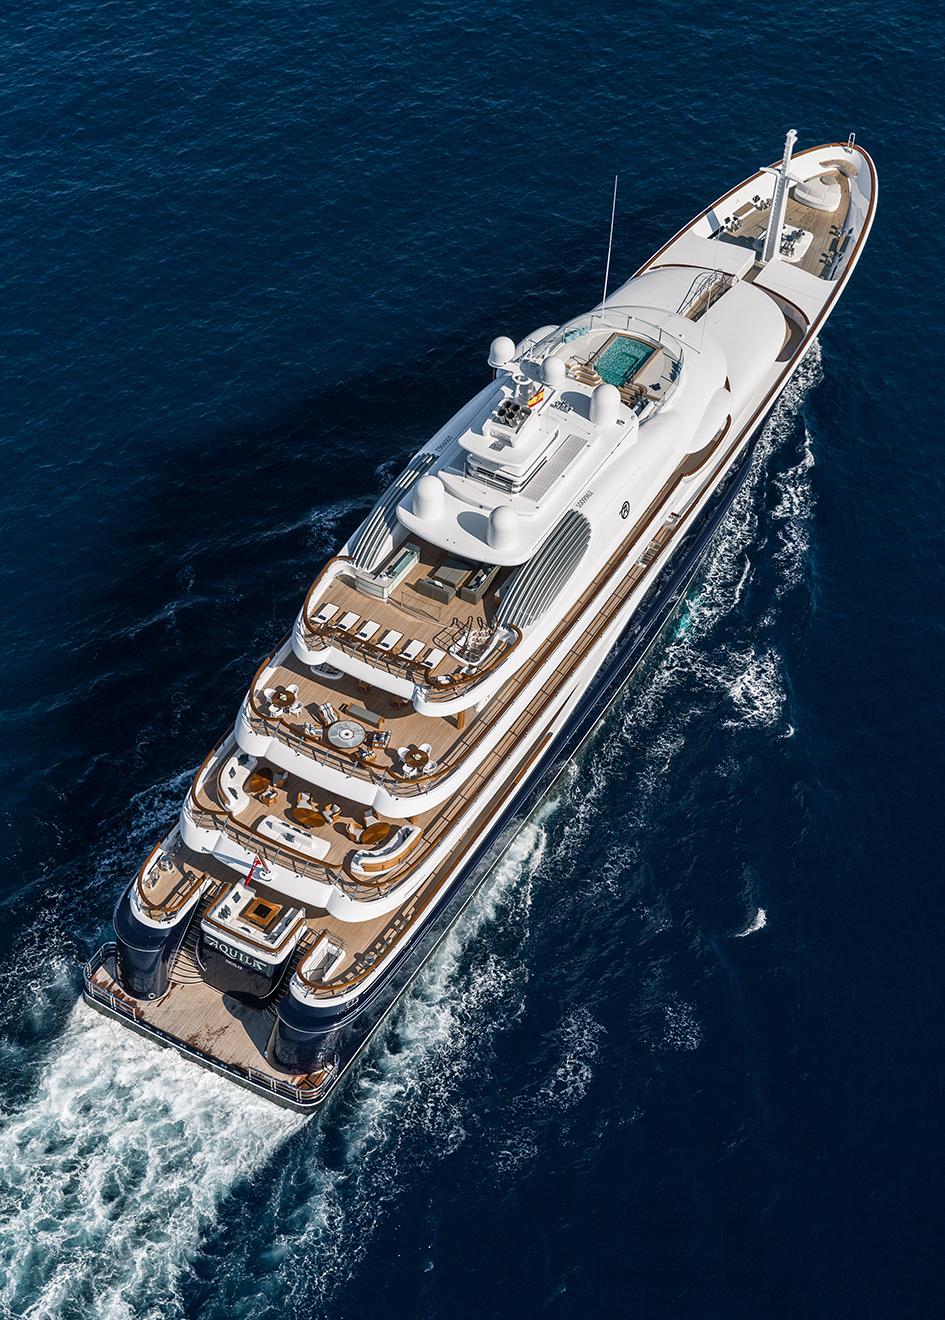 aerial-view-of-the-derektor-superyacht-aquila-after-her-pendennis-refit